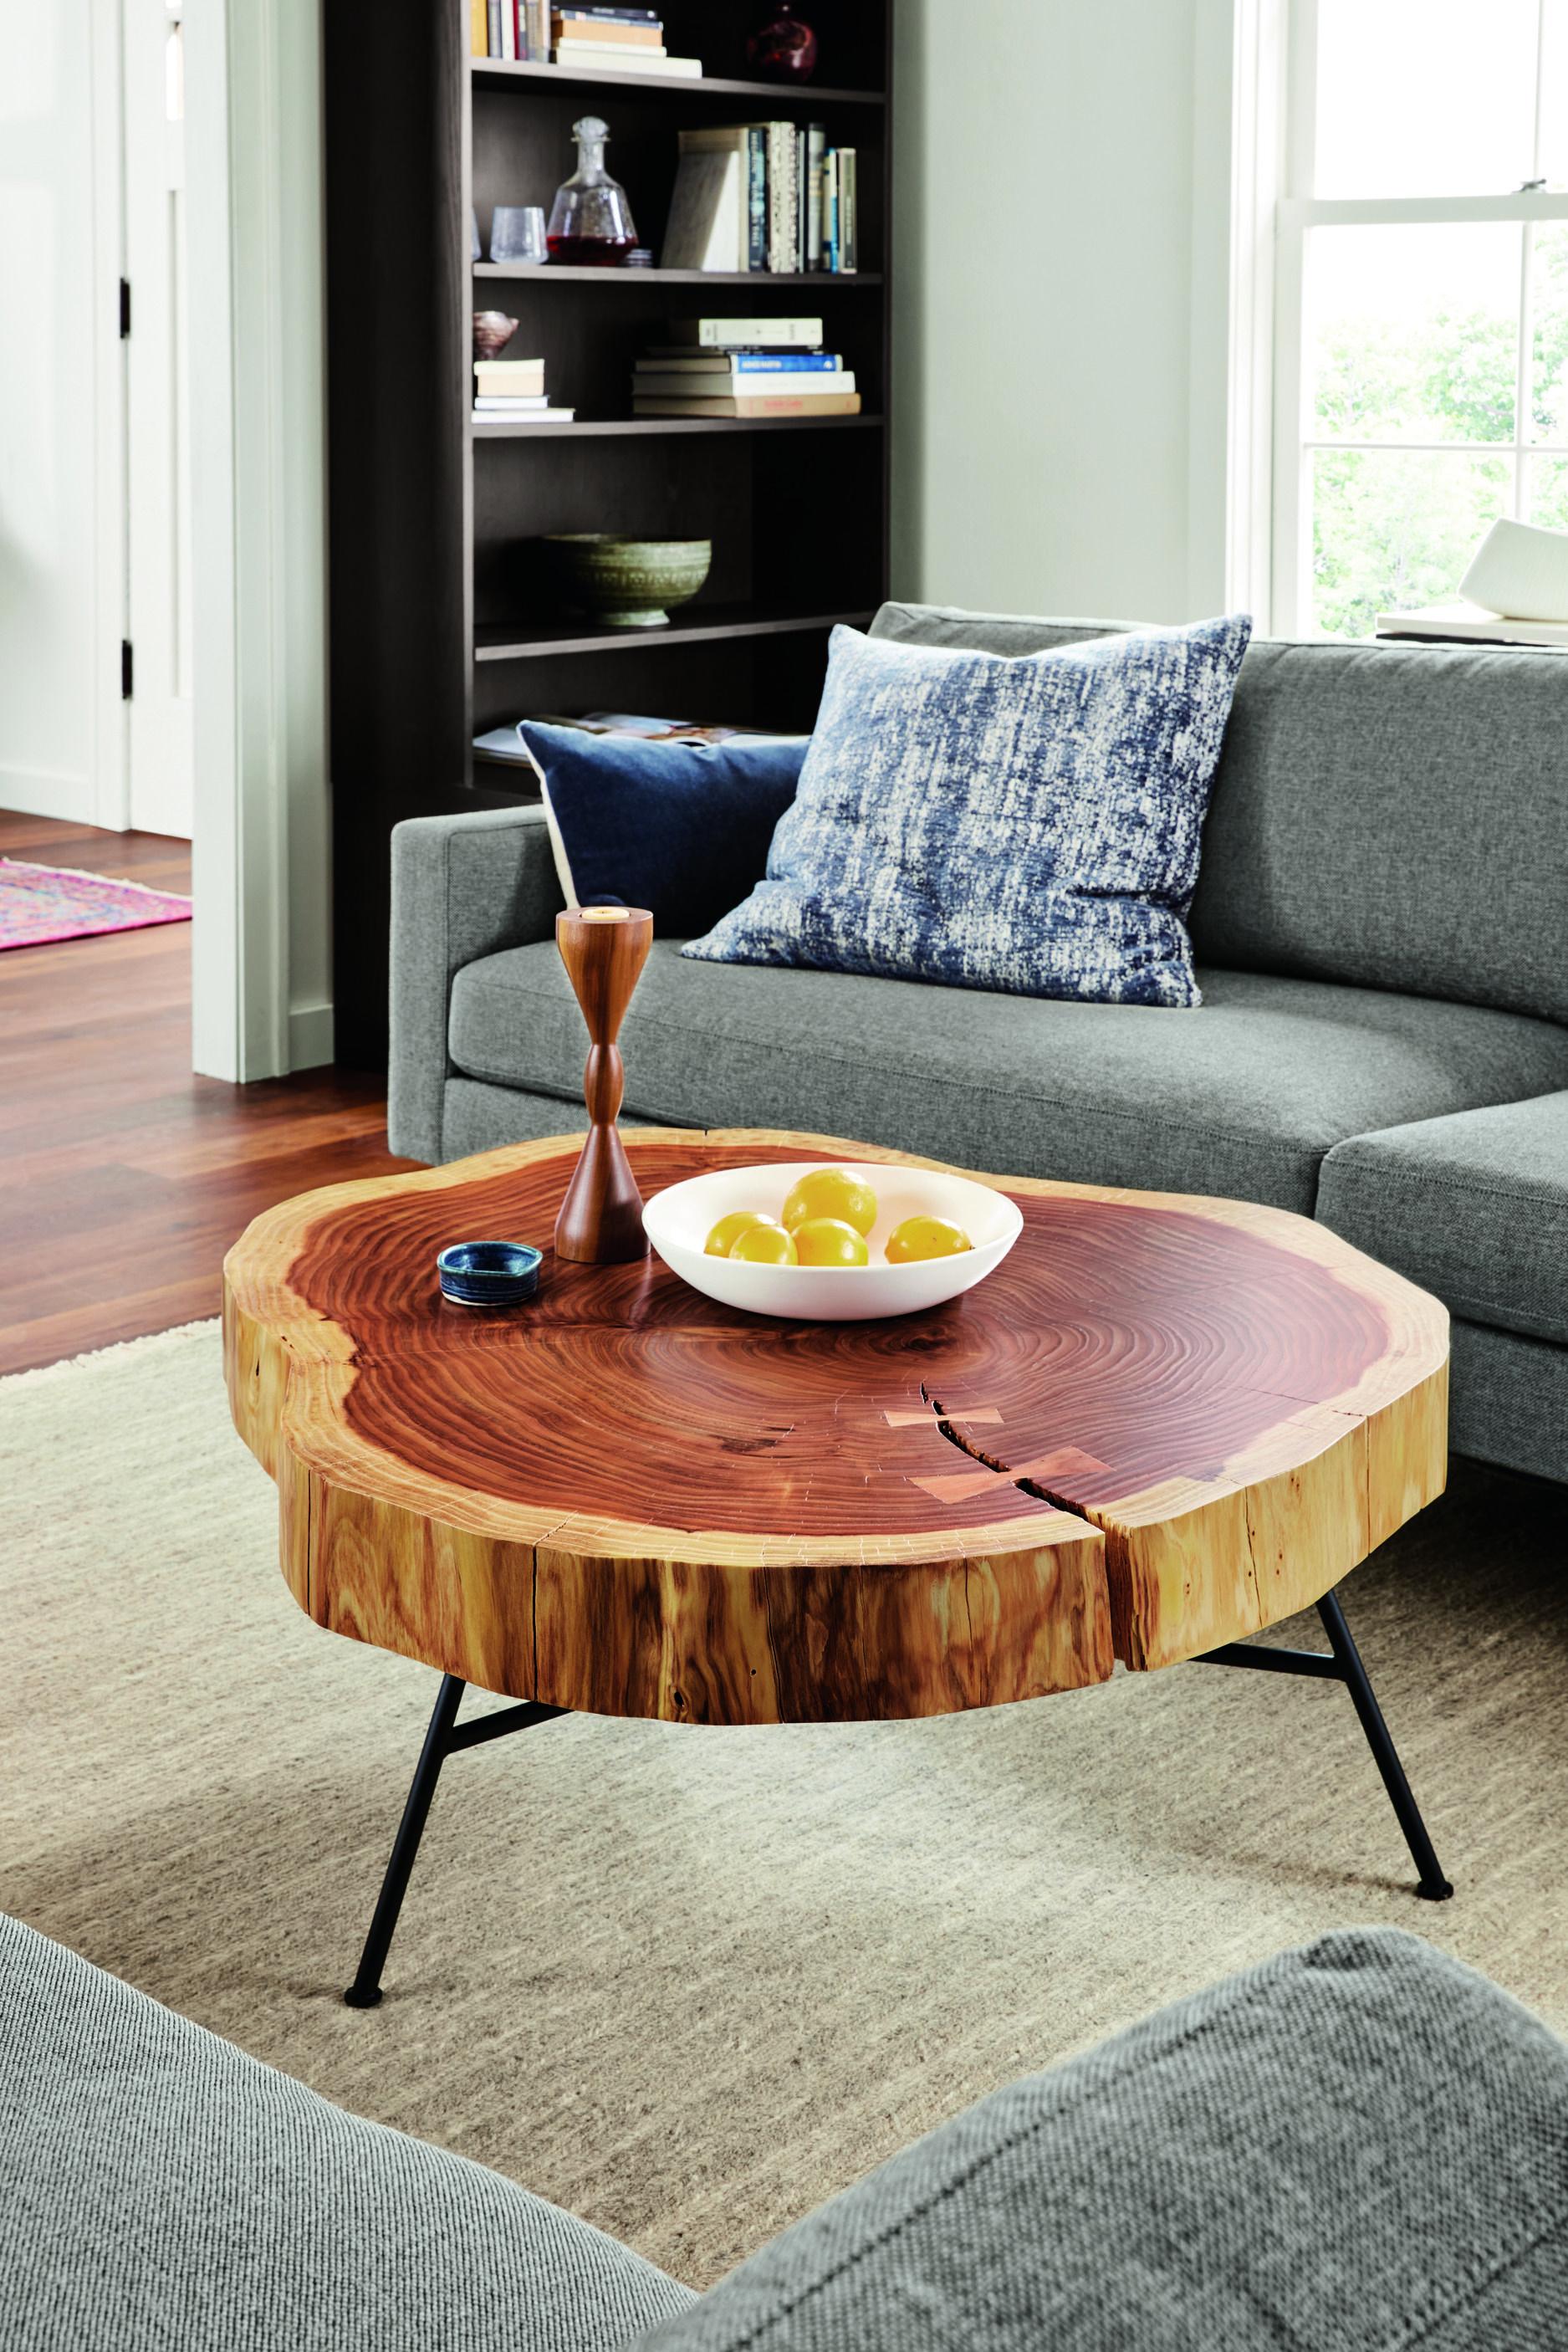 Truxel Coffee Tables Modern Coffee Tables Modern Living Room Furniture Room Board Modern Furniture Living Room Coffee Table Room And Board Furniture